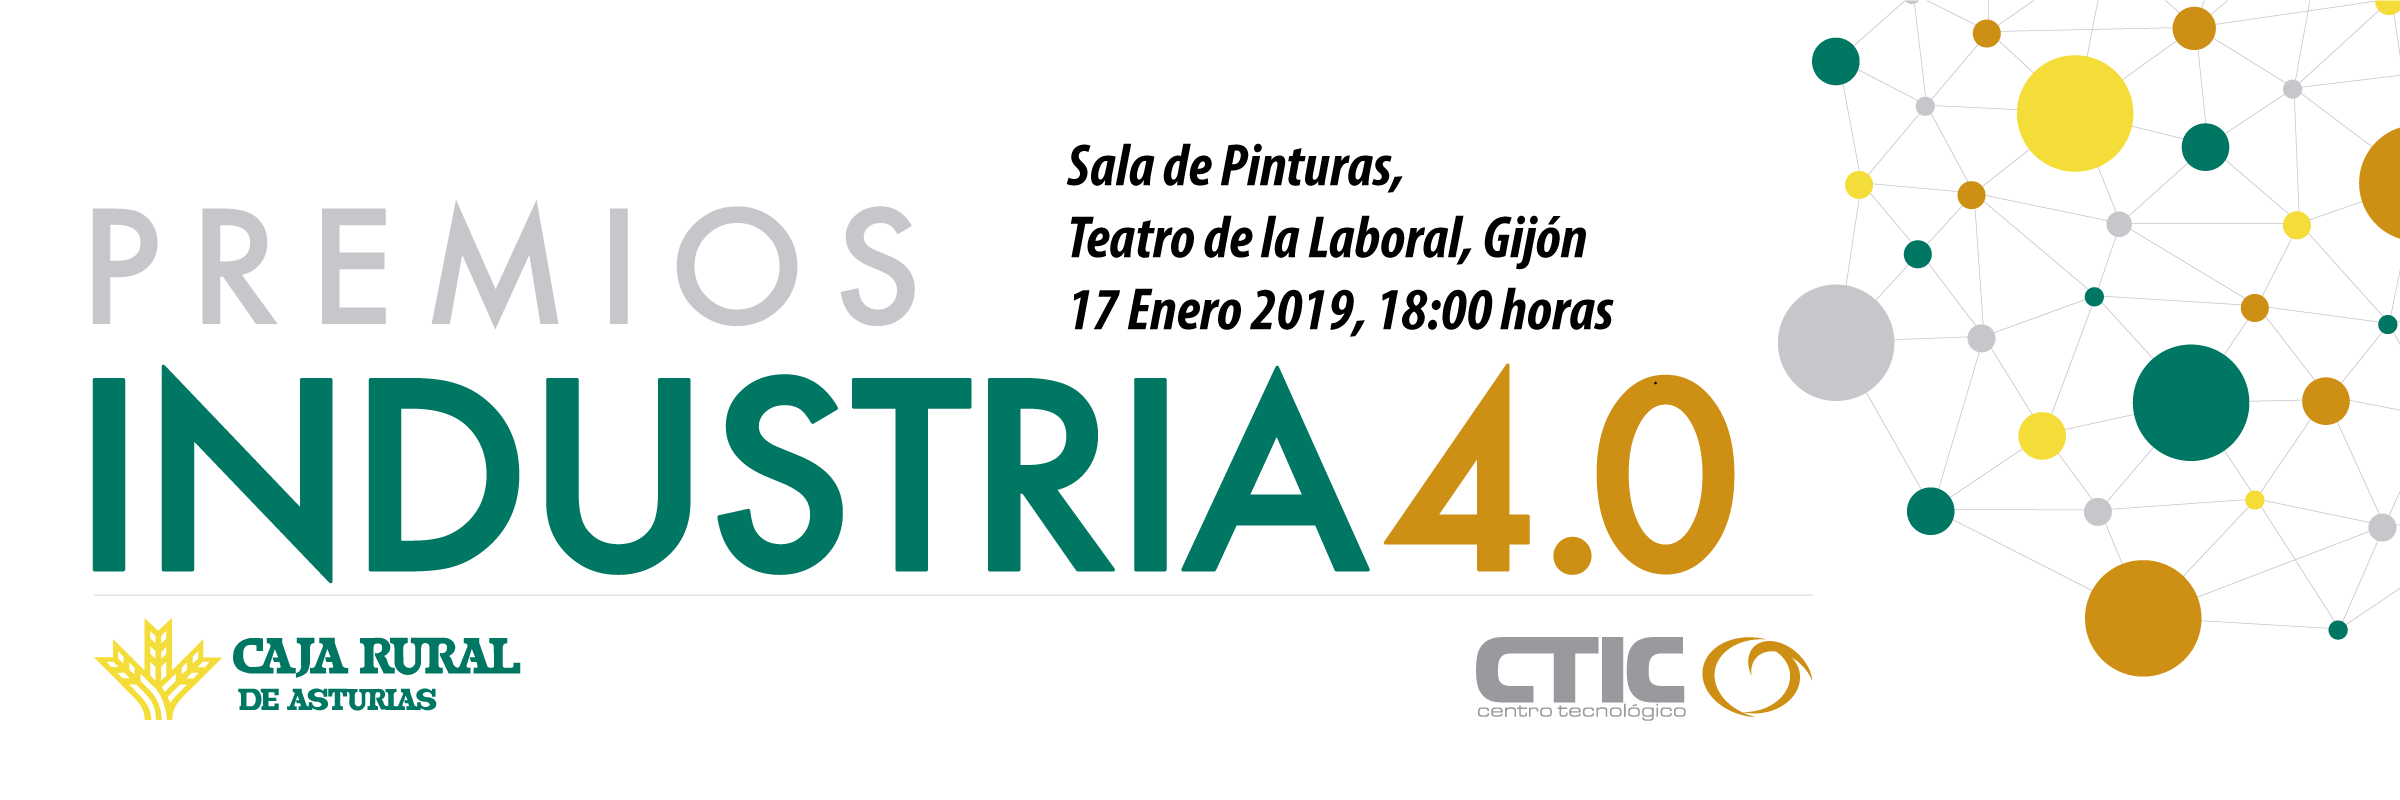 Premios Industria 4.0